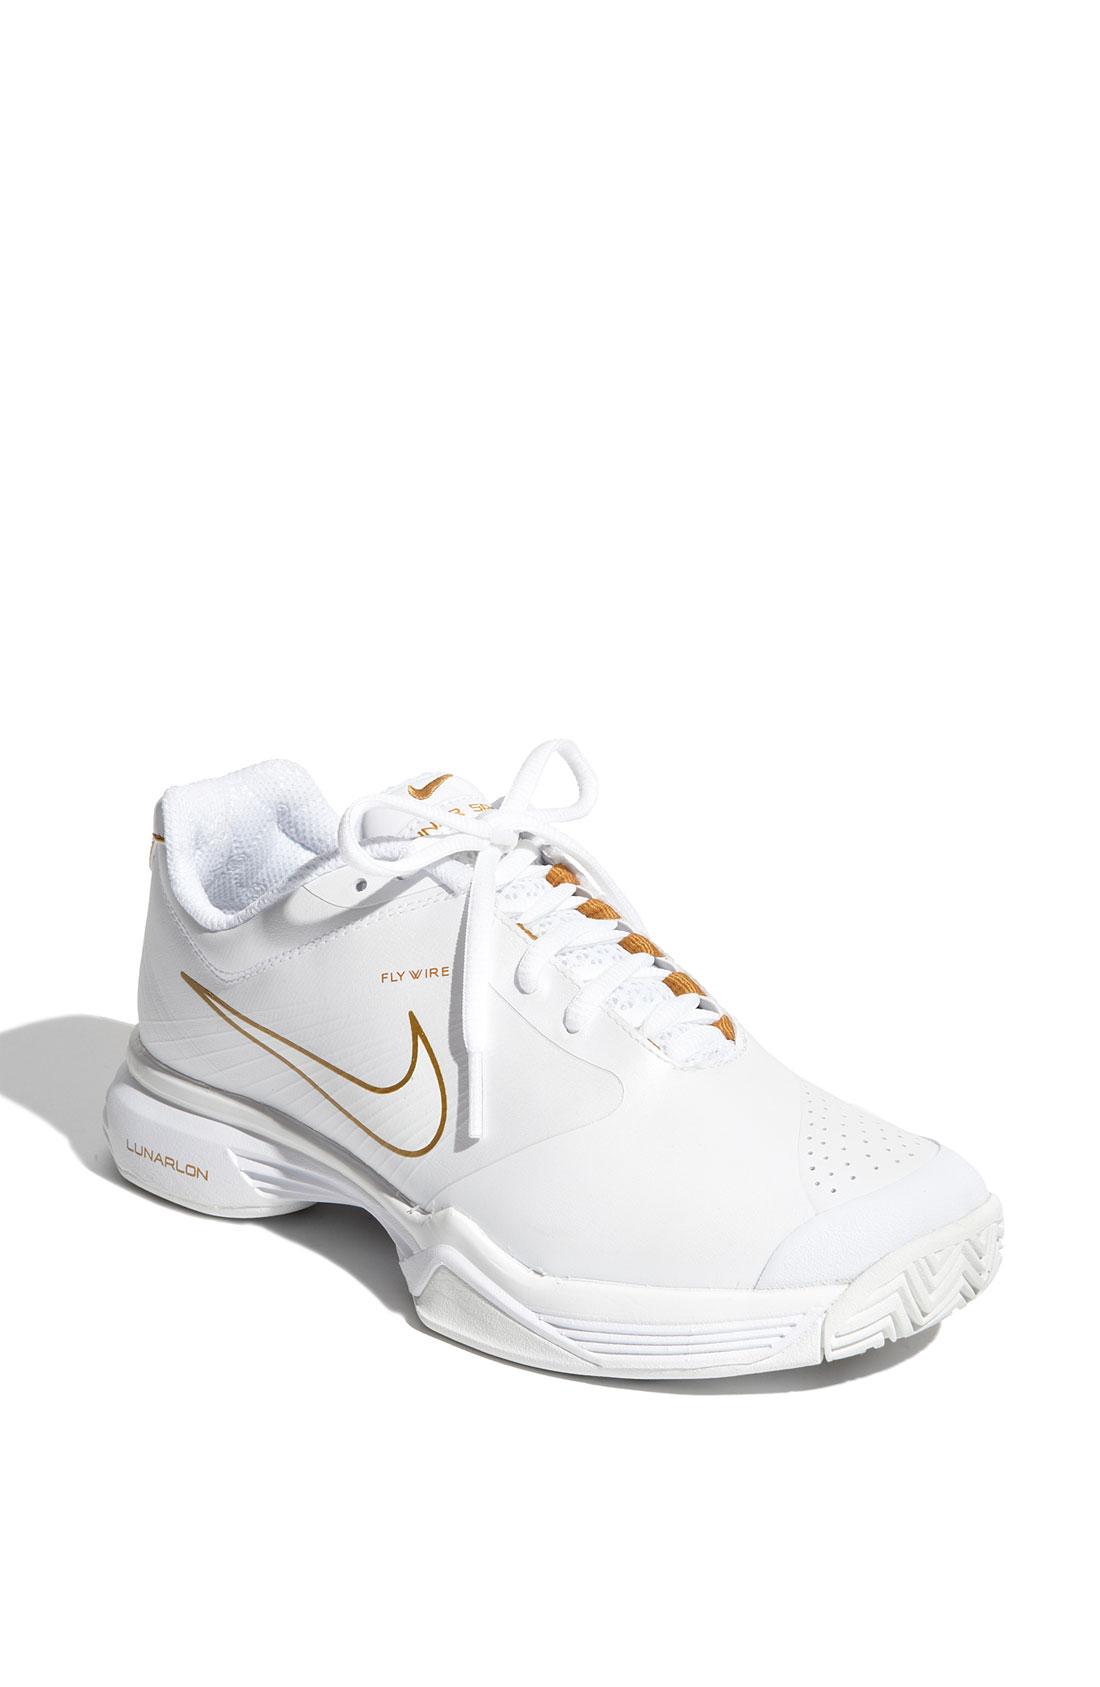 Nike Lunar Speed 3 Tennis Shoe (women) in White (white/ white/ bronze